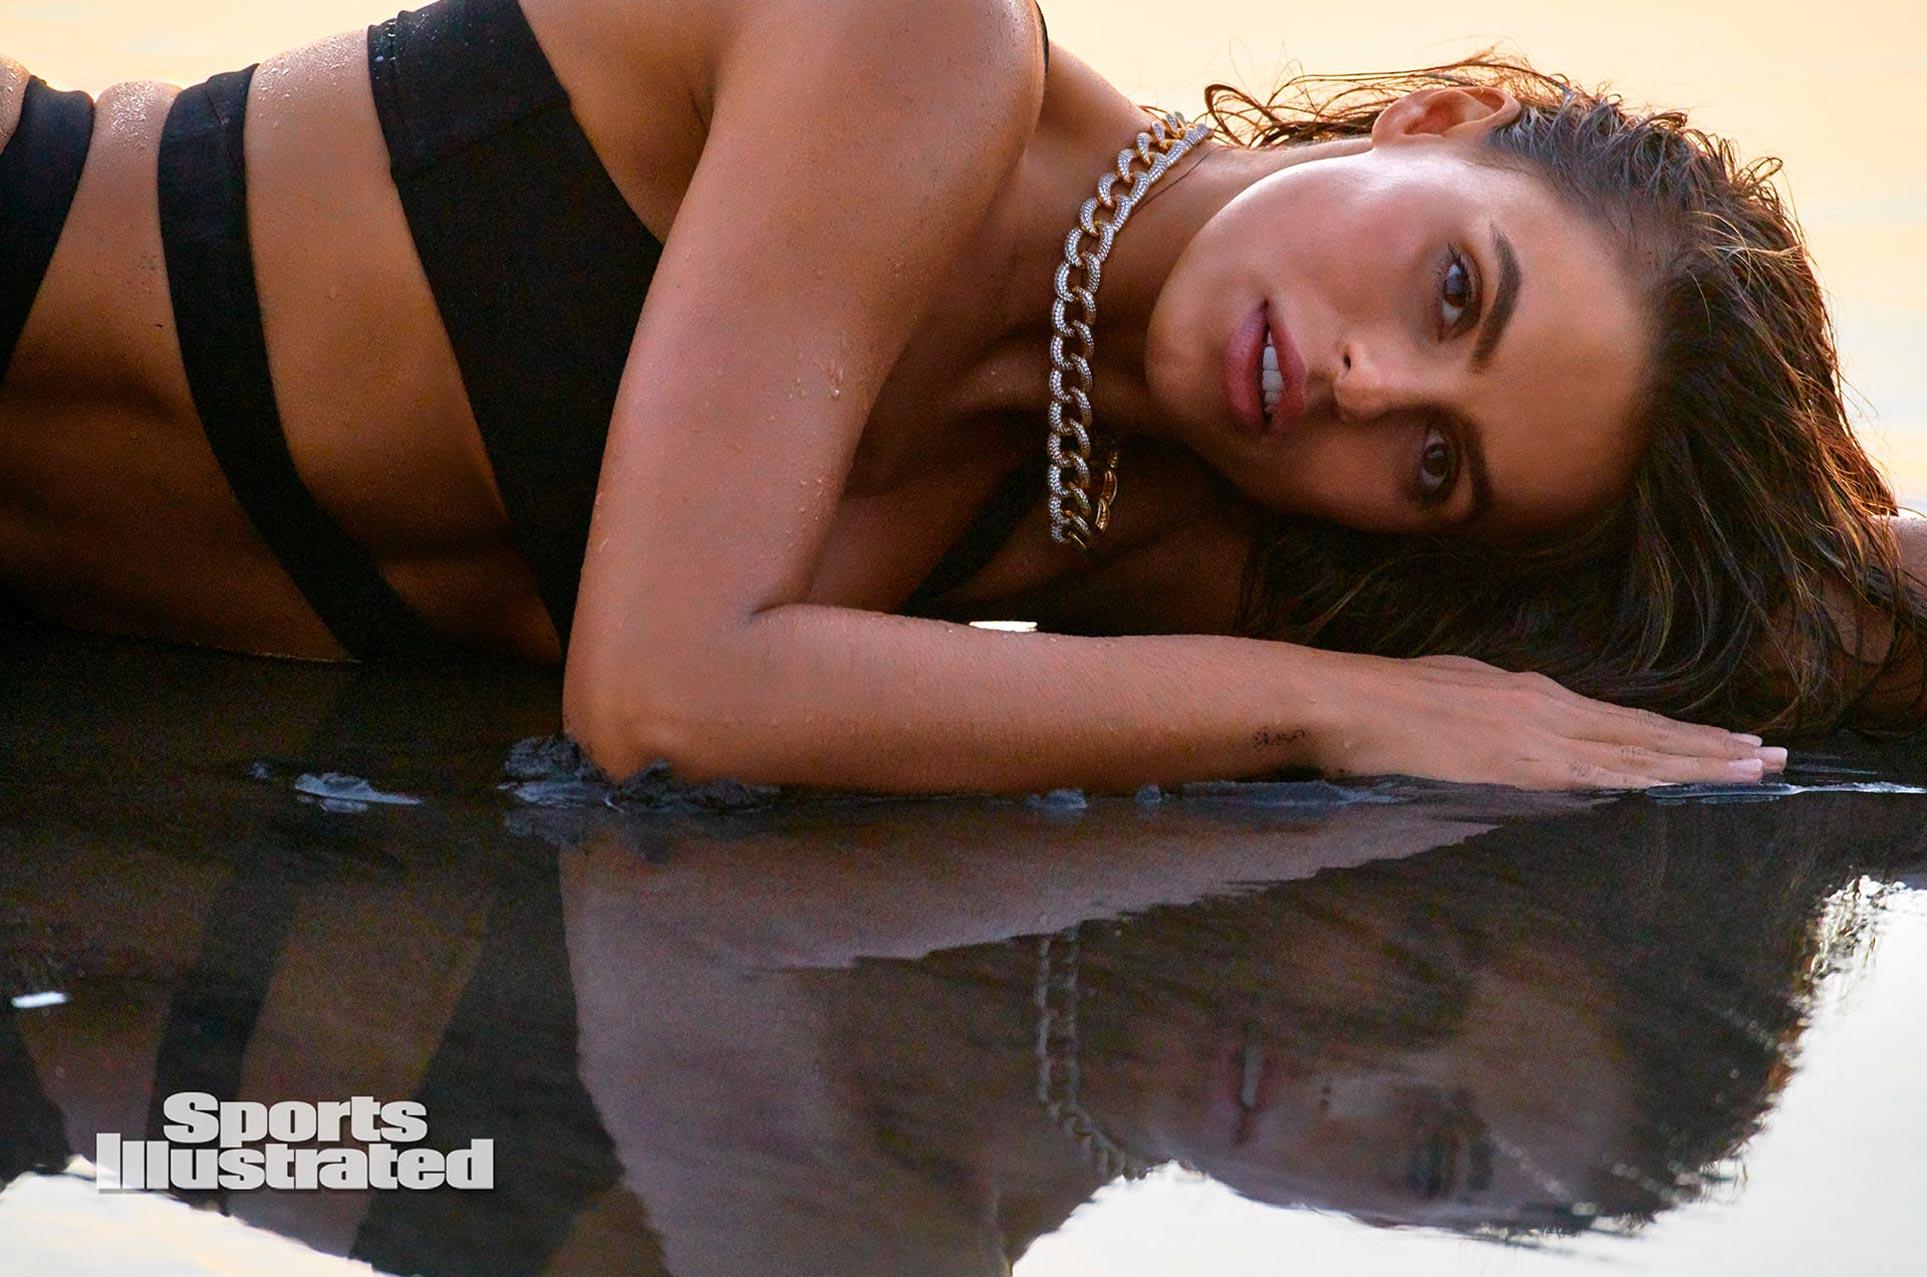 Брукс Надер в каталоге купальников Sports Illustrated Swimsuit 2020 / фото 27